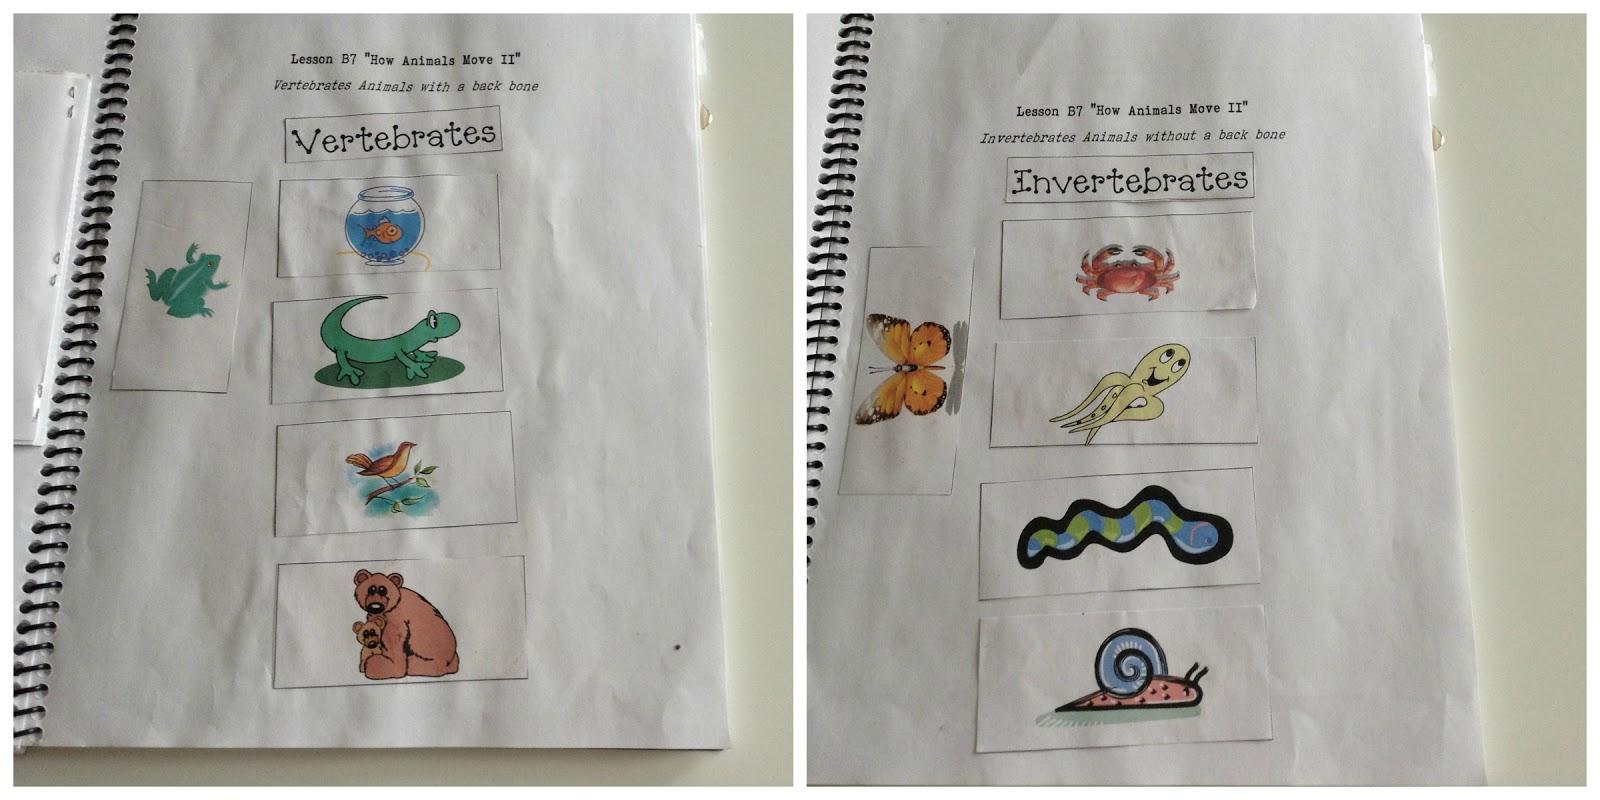 TeacherMomPlus3 Vertebrates and Invertebrates Unit Study – Invertebrates Worksheet